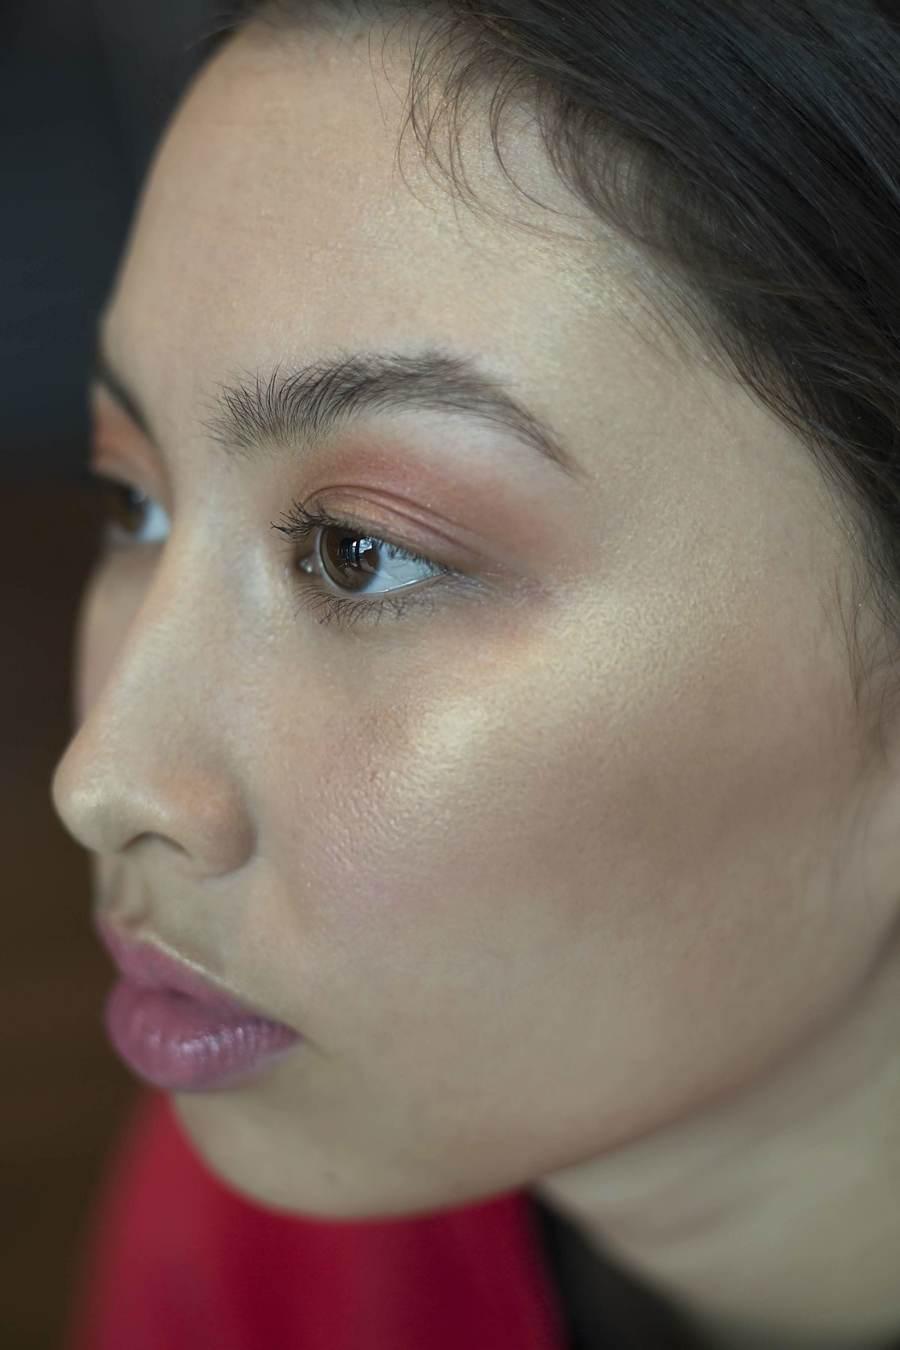 Makeup by Kelliemarnochmua / Uploaded 26th May 2018 @ 12:59 PM